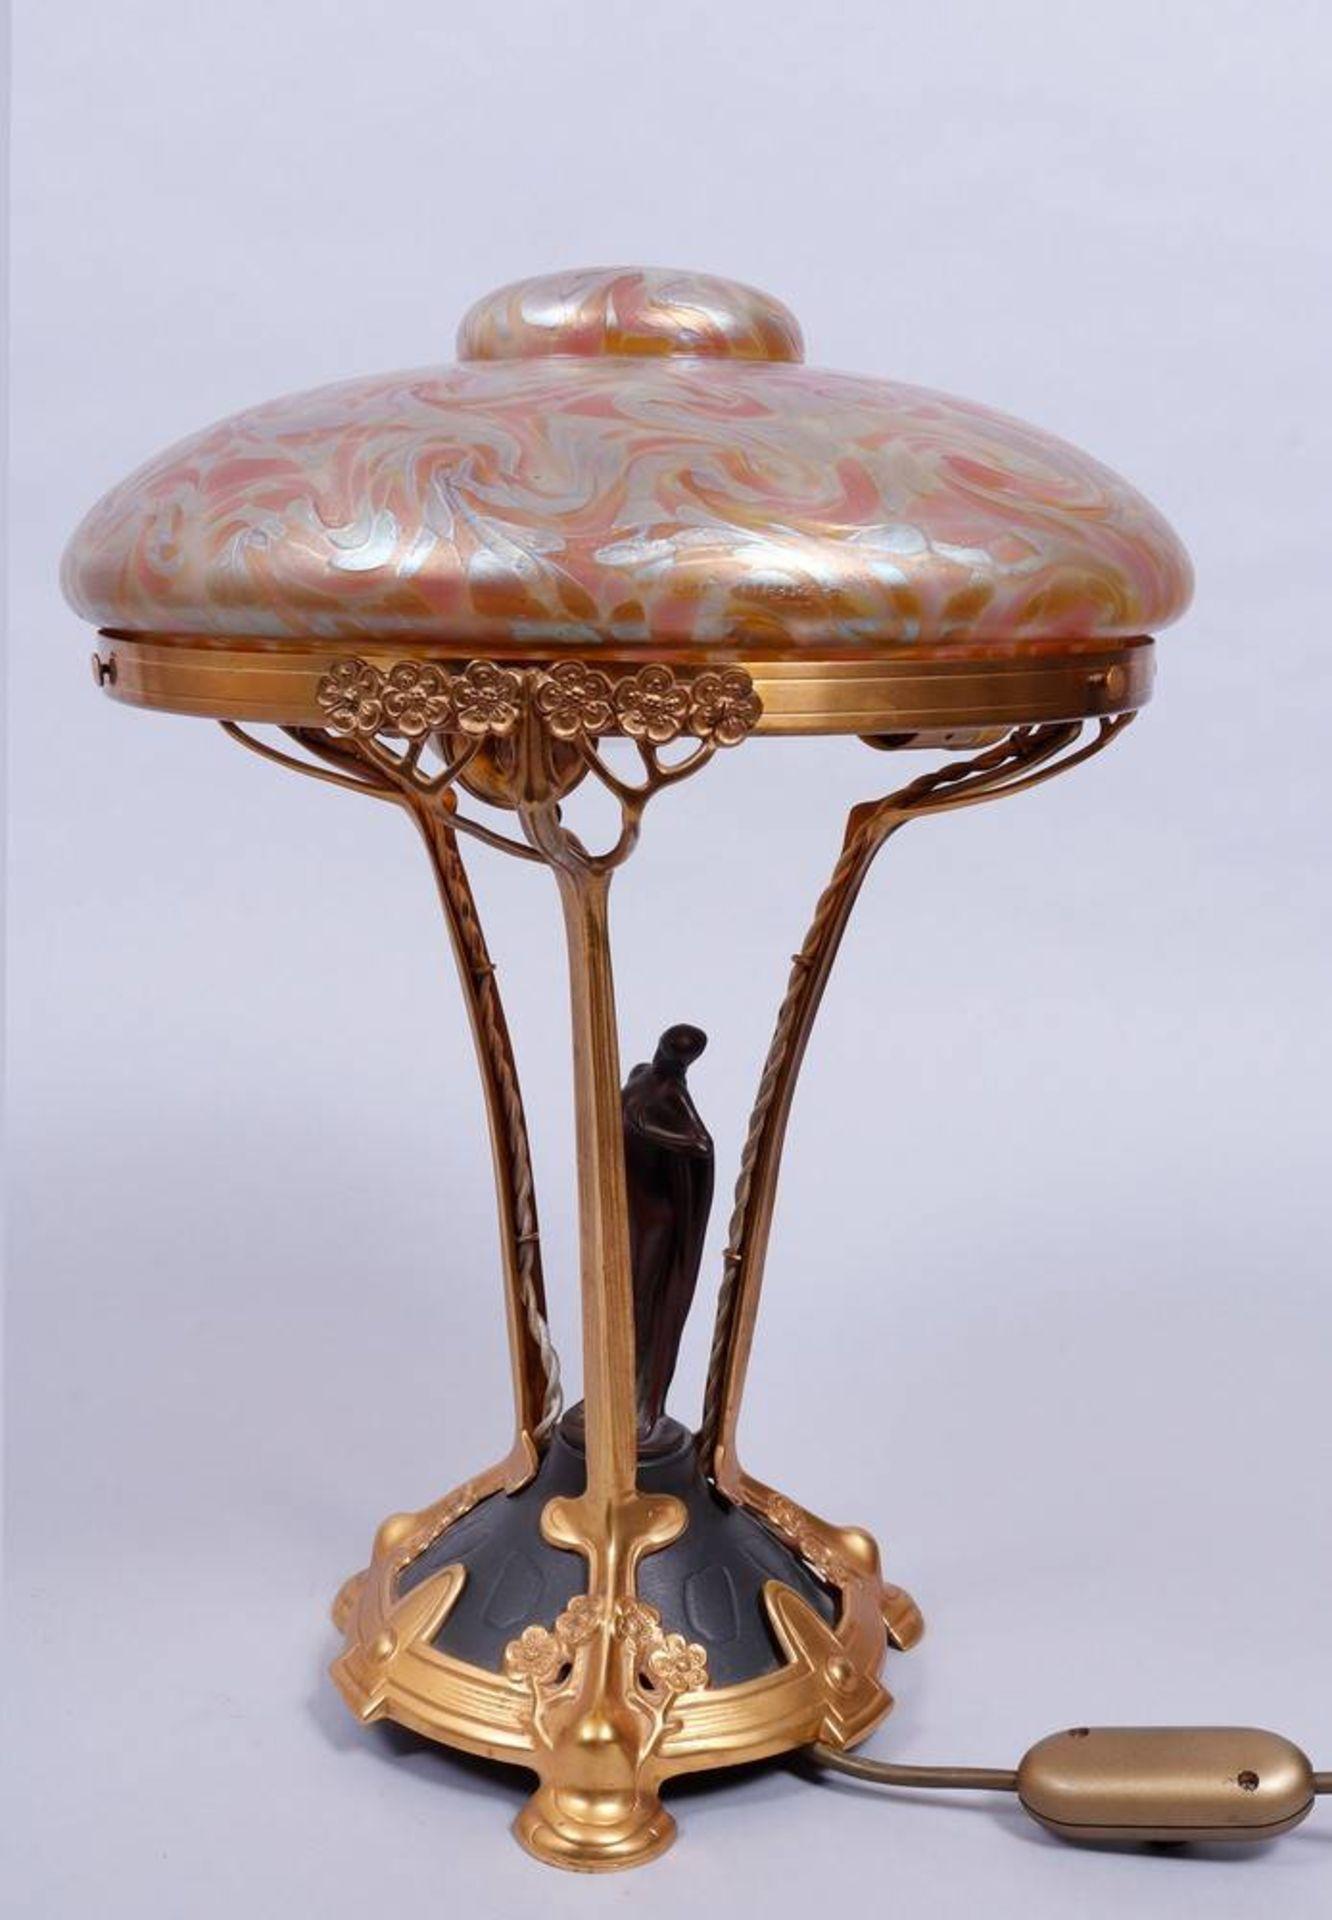 Art Nouveau table lamp, probably Loetz, 1st half 20th C. - Image 2 of 6